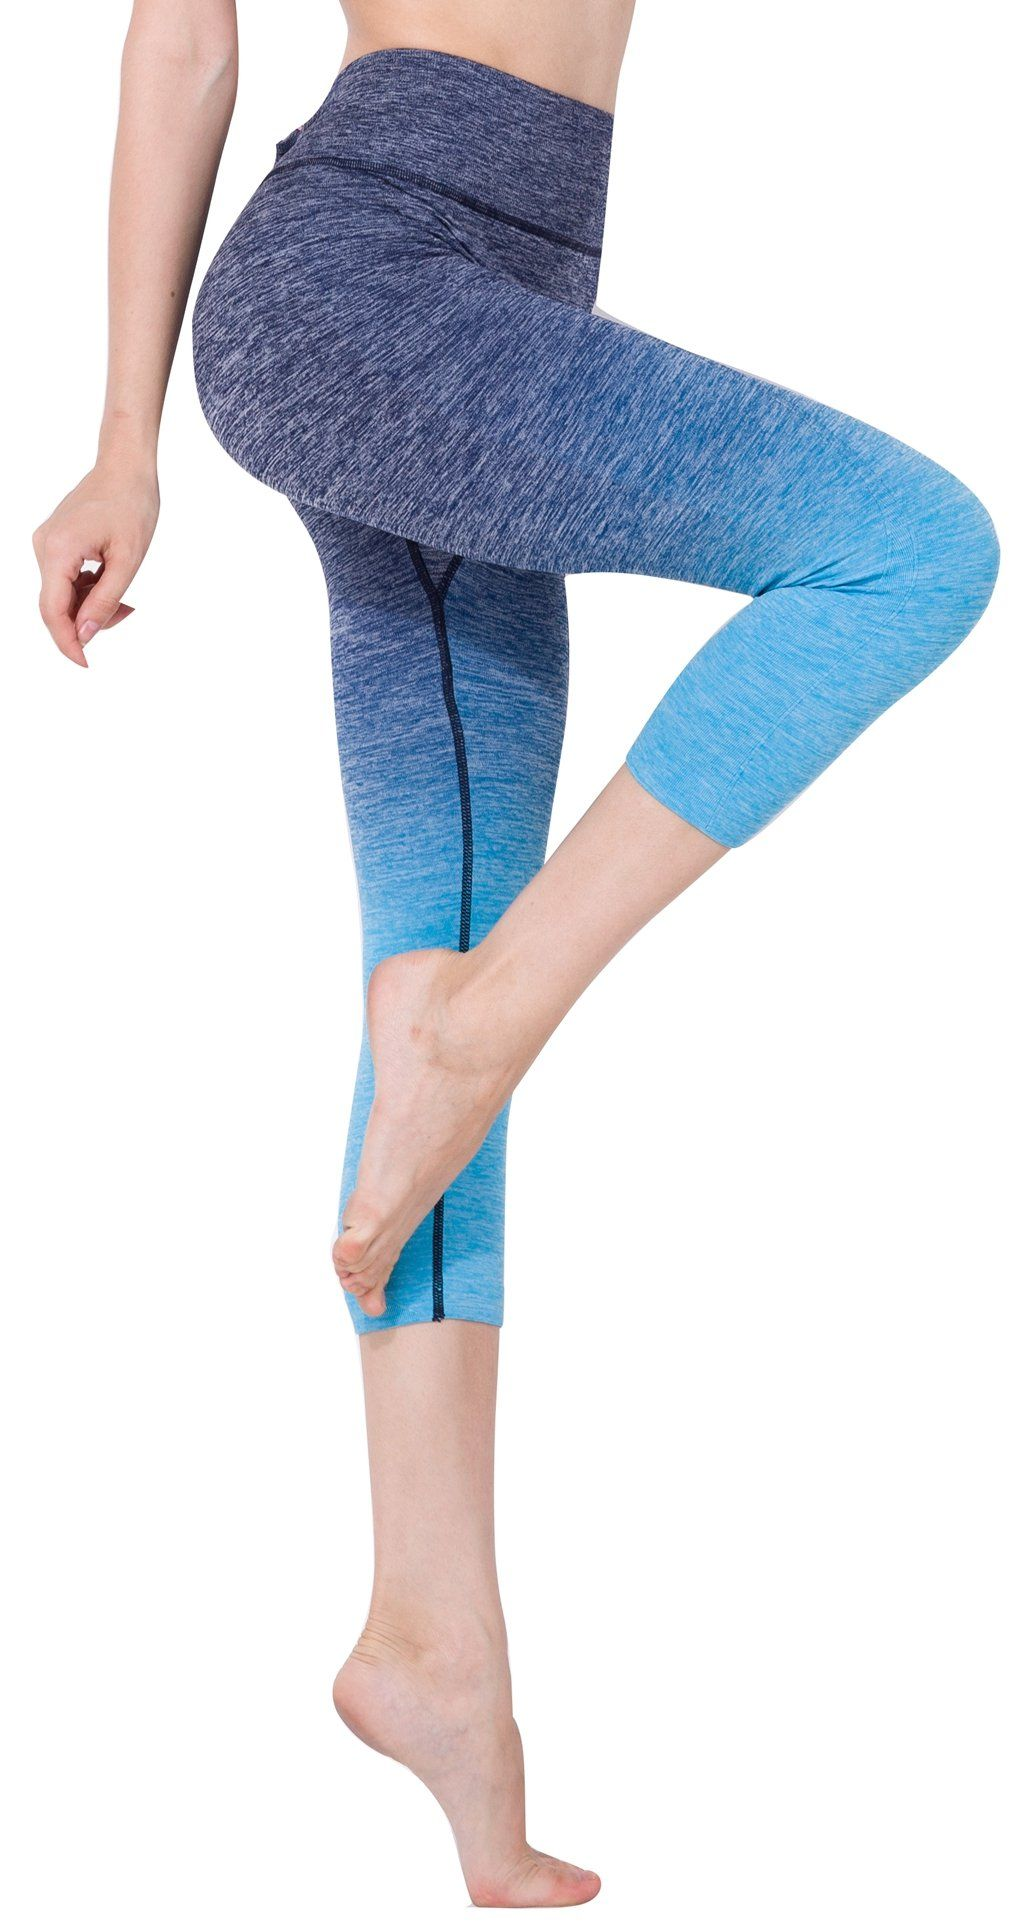 443ea9a8688fed Amazon.com: Bonas Women's Ombre 3/4 Tights Capri Yoga Sport Workout Leggings  Pants & Bra Set: Sports & Outdoors